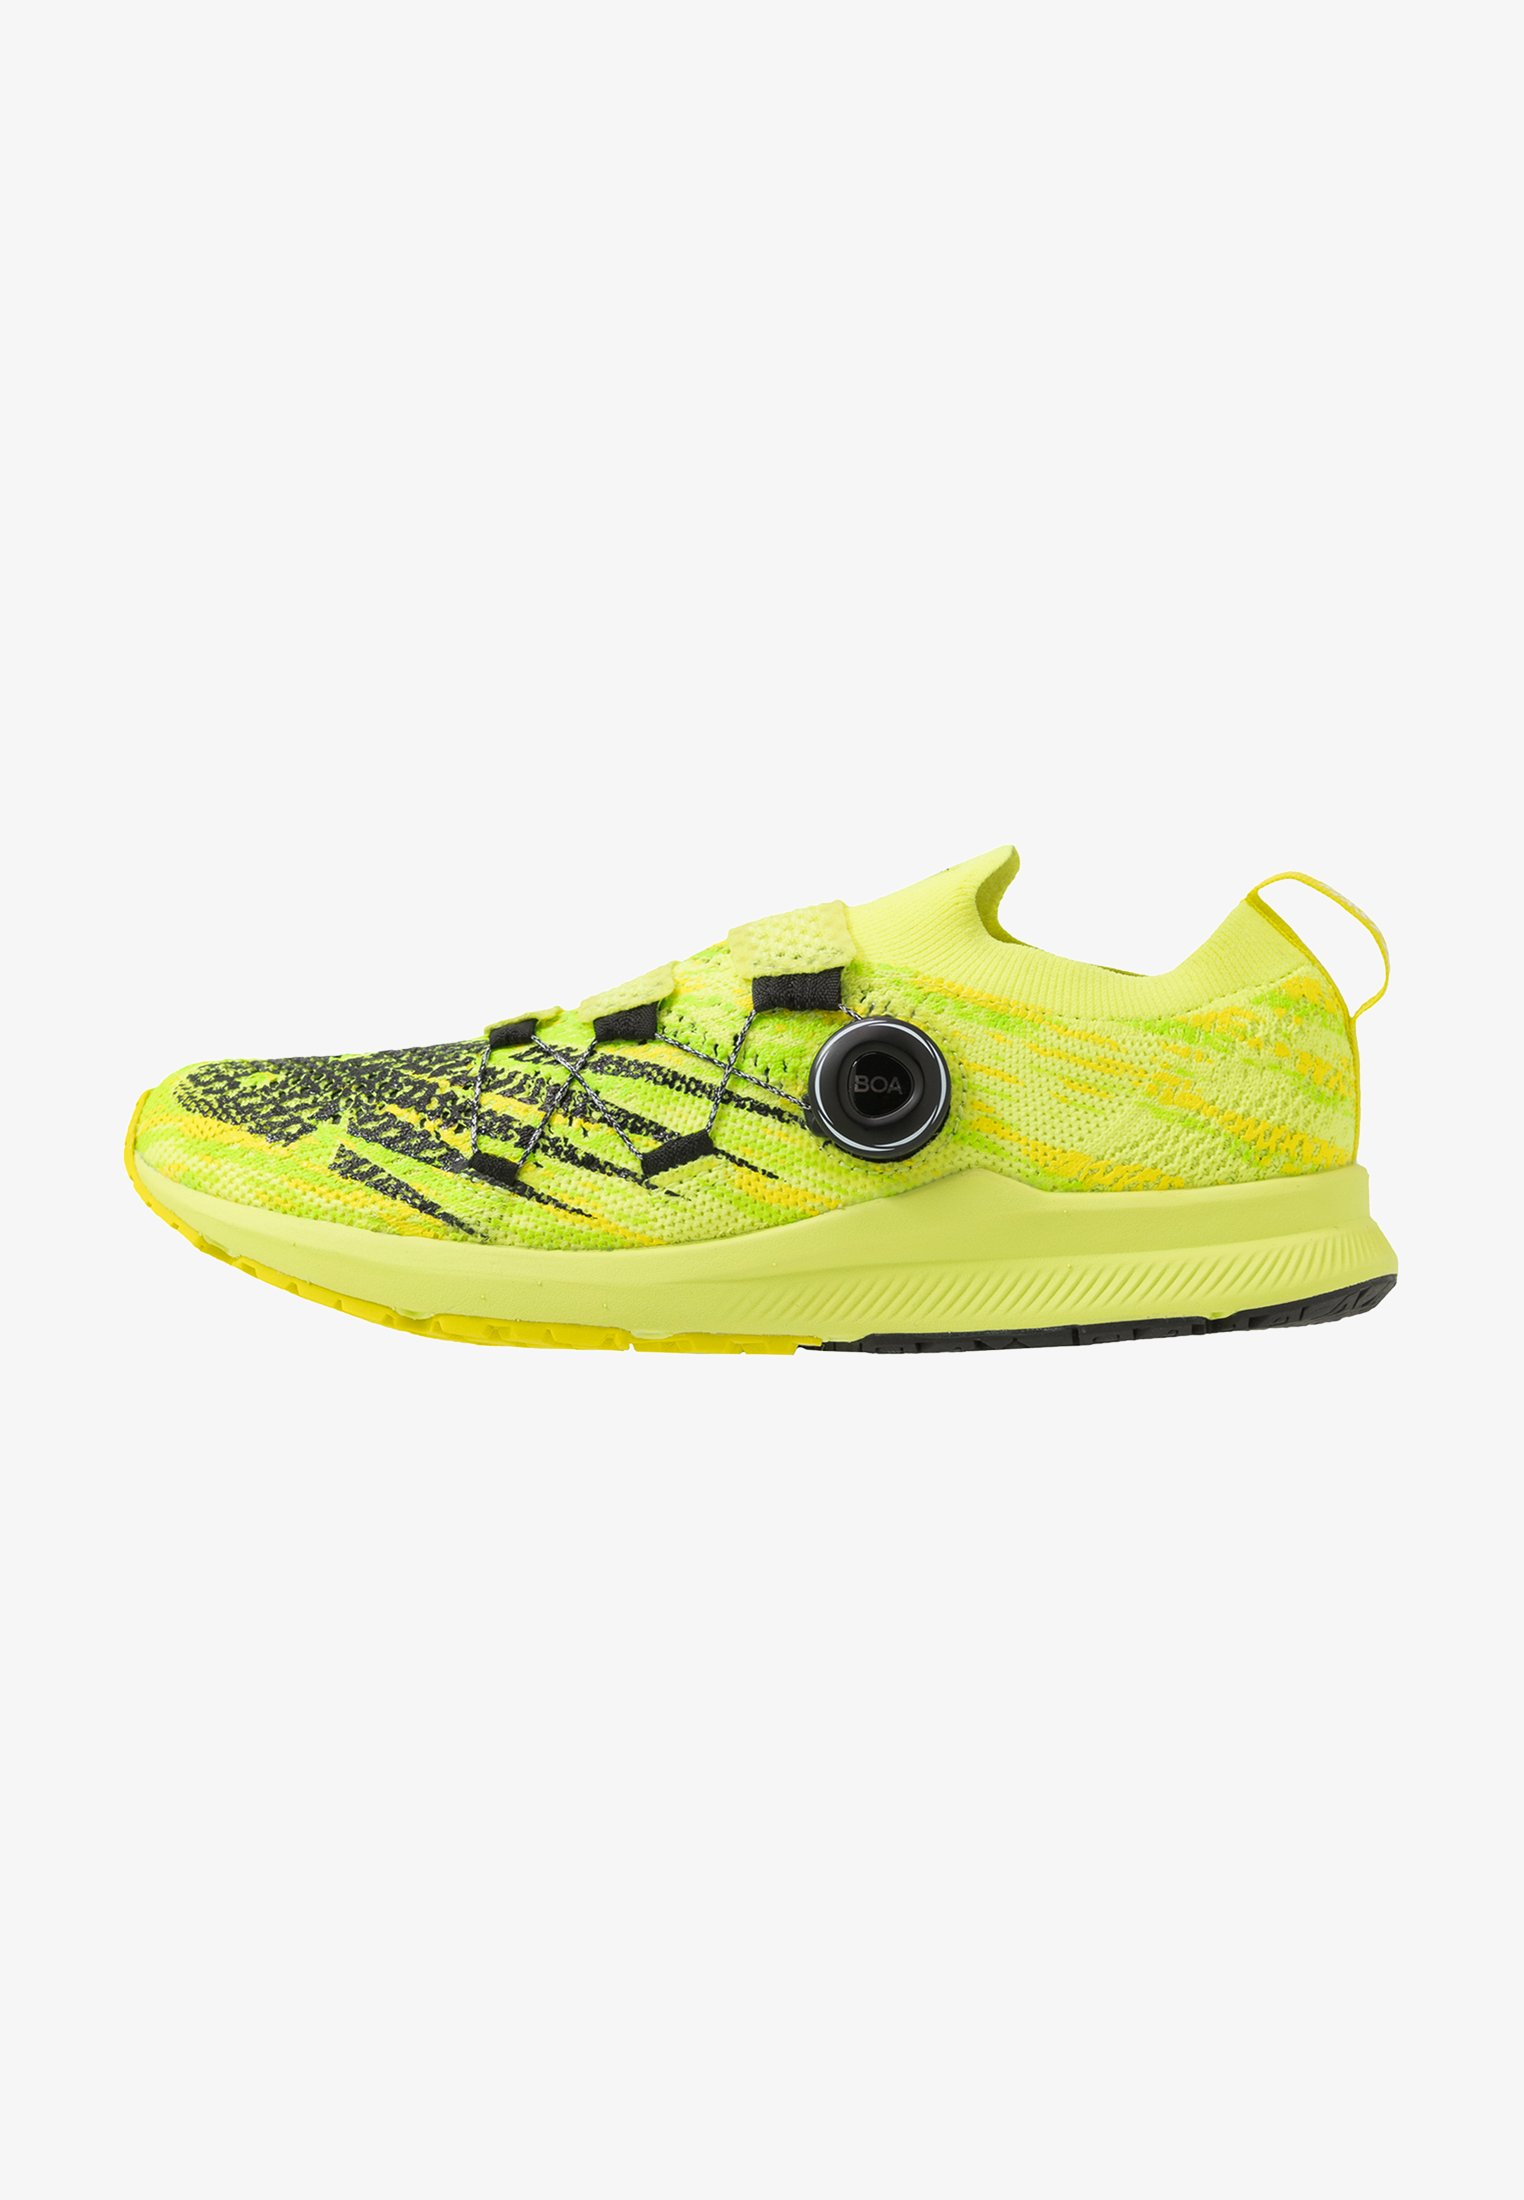 Hierbas Lirio Jabón  New Balance 1500 V6 BOA - Competition running shoes - yellow/neon yellow -  Zalando.ie